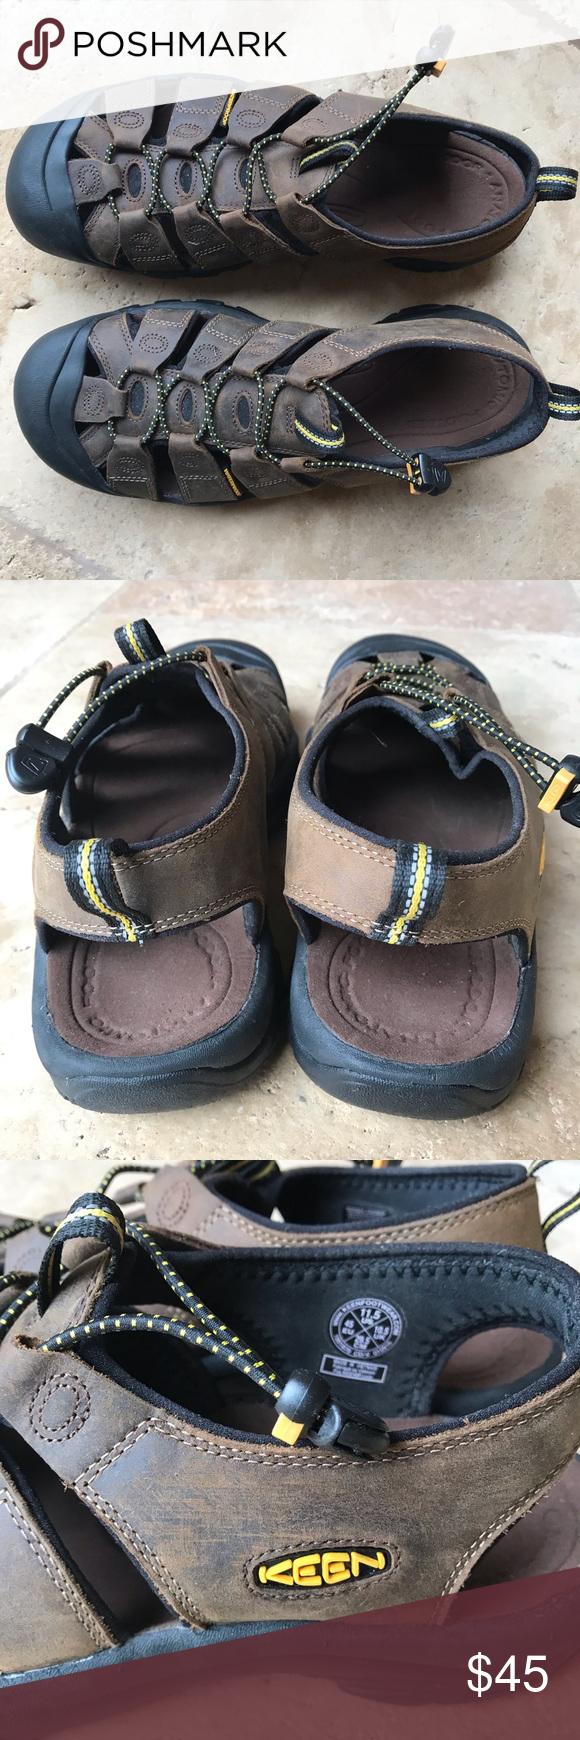 6d428af08e98 Keen men sandals size 11.5 waterproof Keen men s size 11.5 waterproof sport  sandals Pre-owned in good condition Shoes Sandals   Flip-Flops